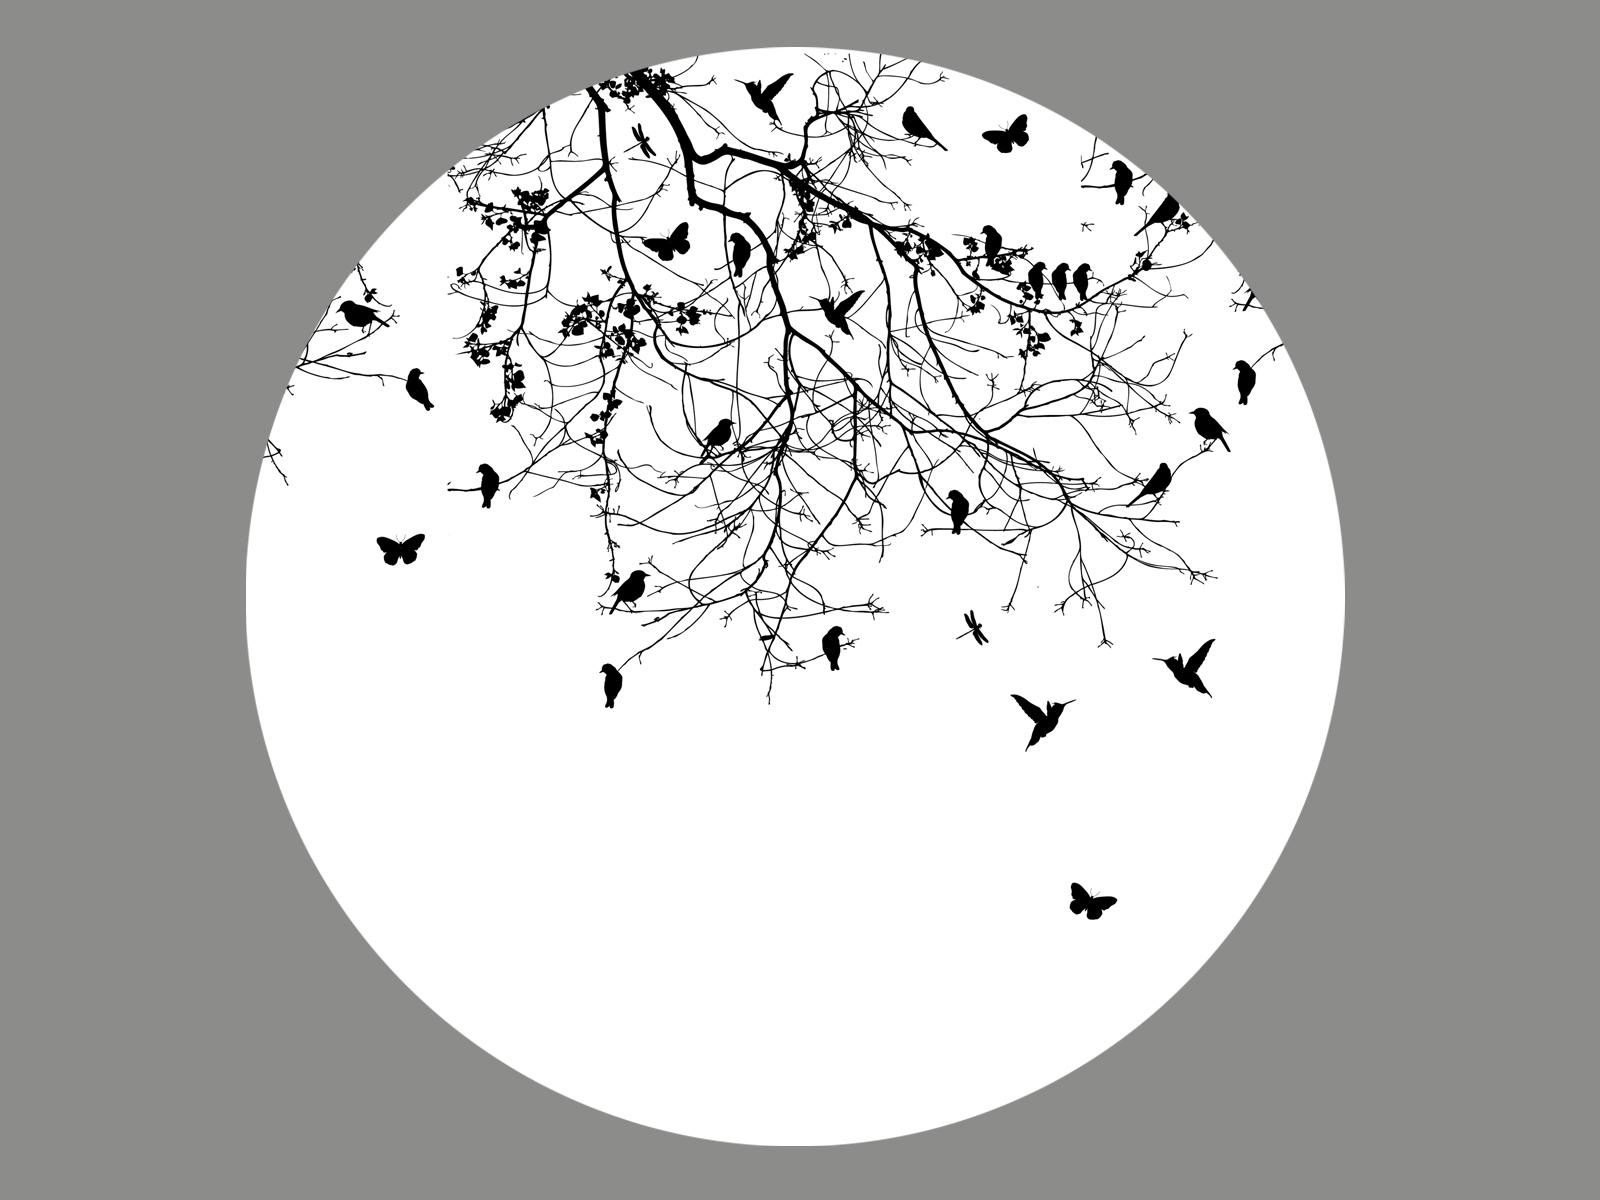 Vögelgrafik Blenderlampe-29